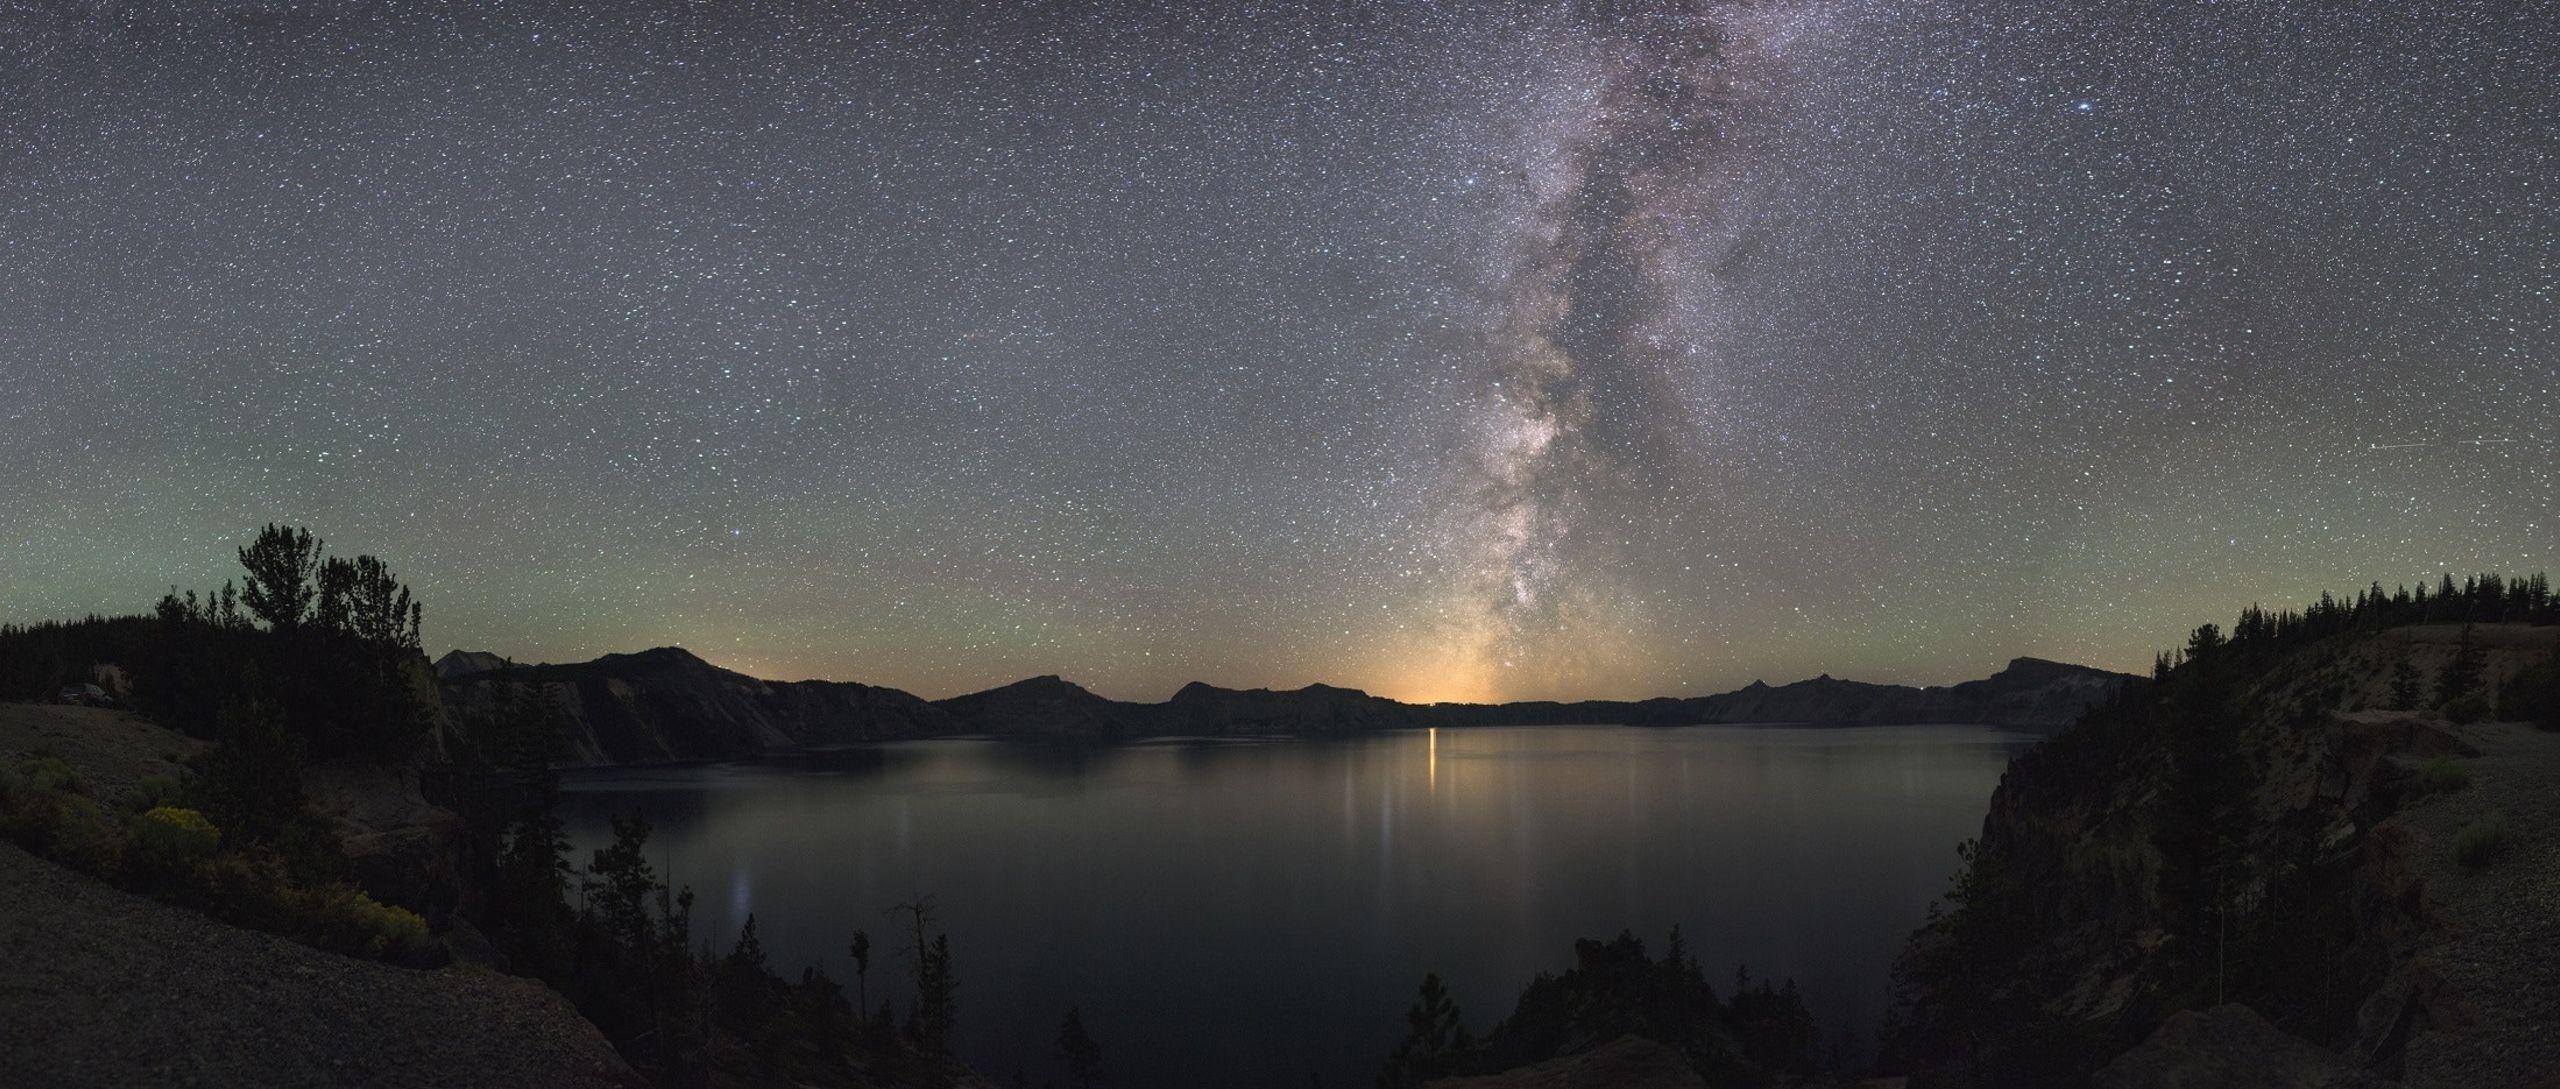 Milky Way over the high desert